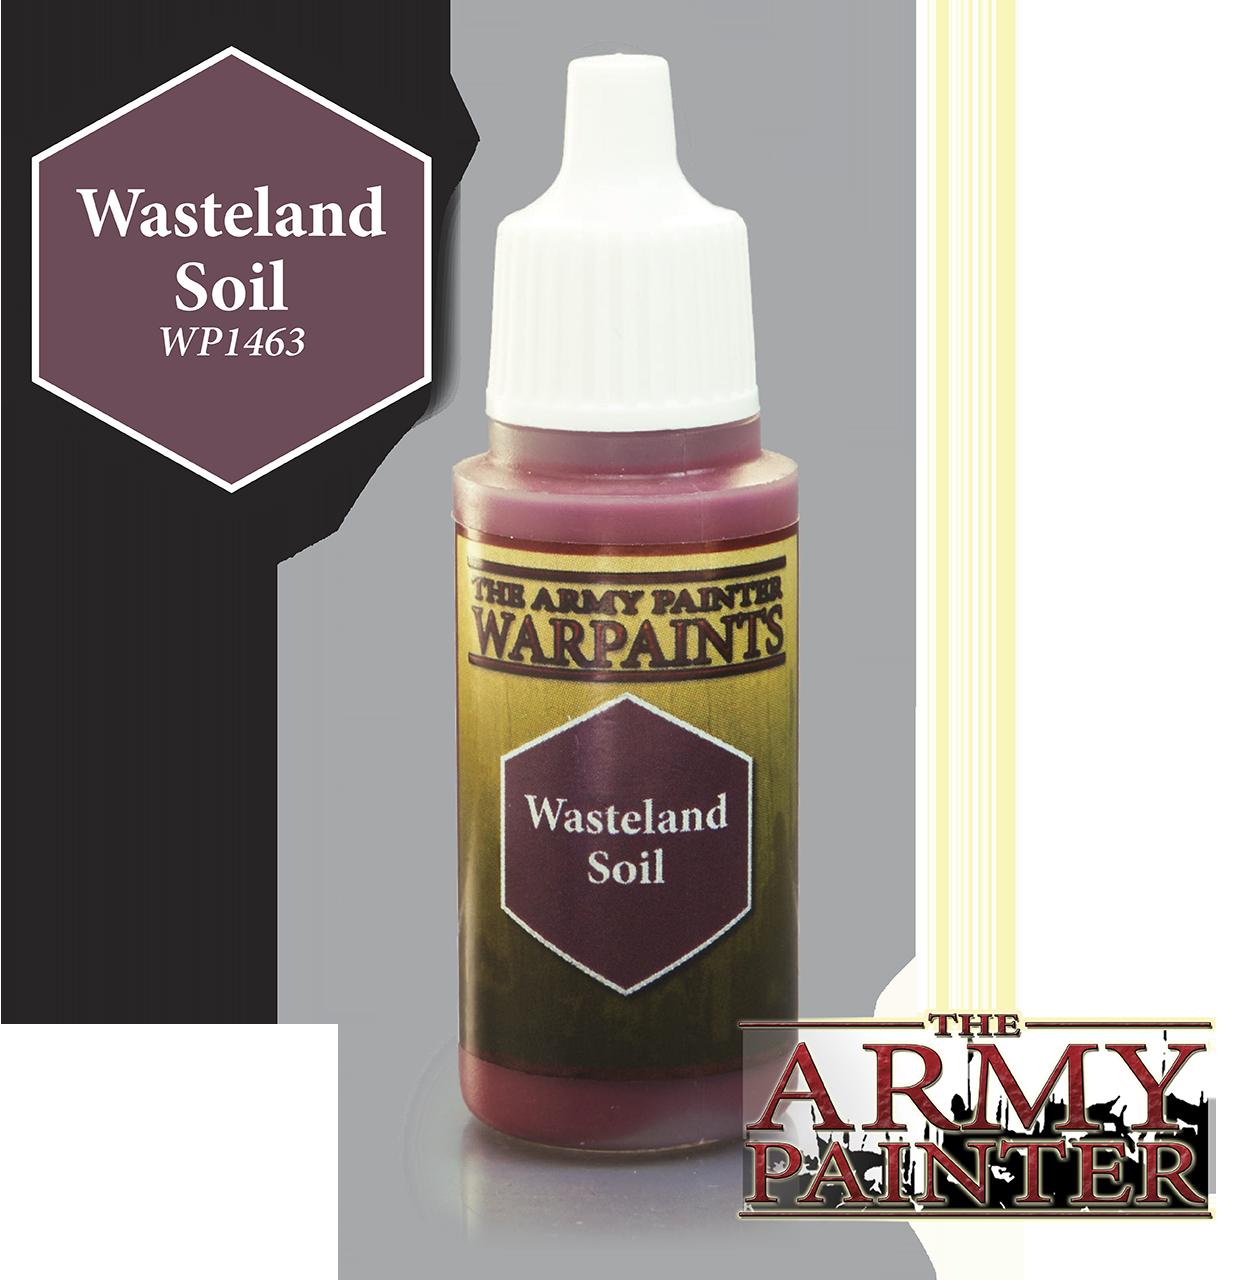 Wasteland Soil - Army Painter Warpaints WP1463